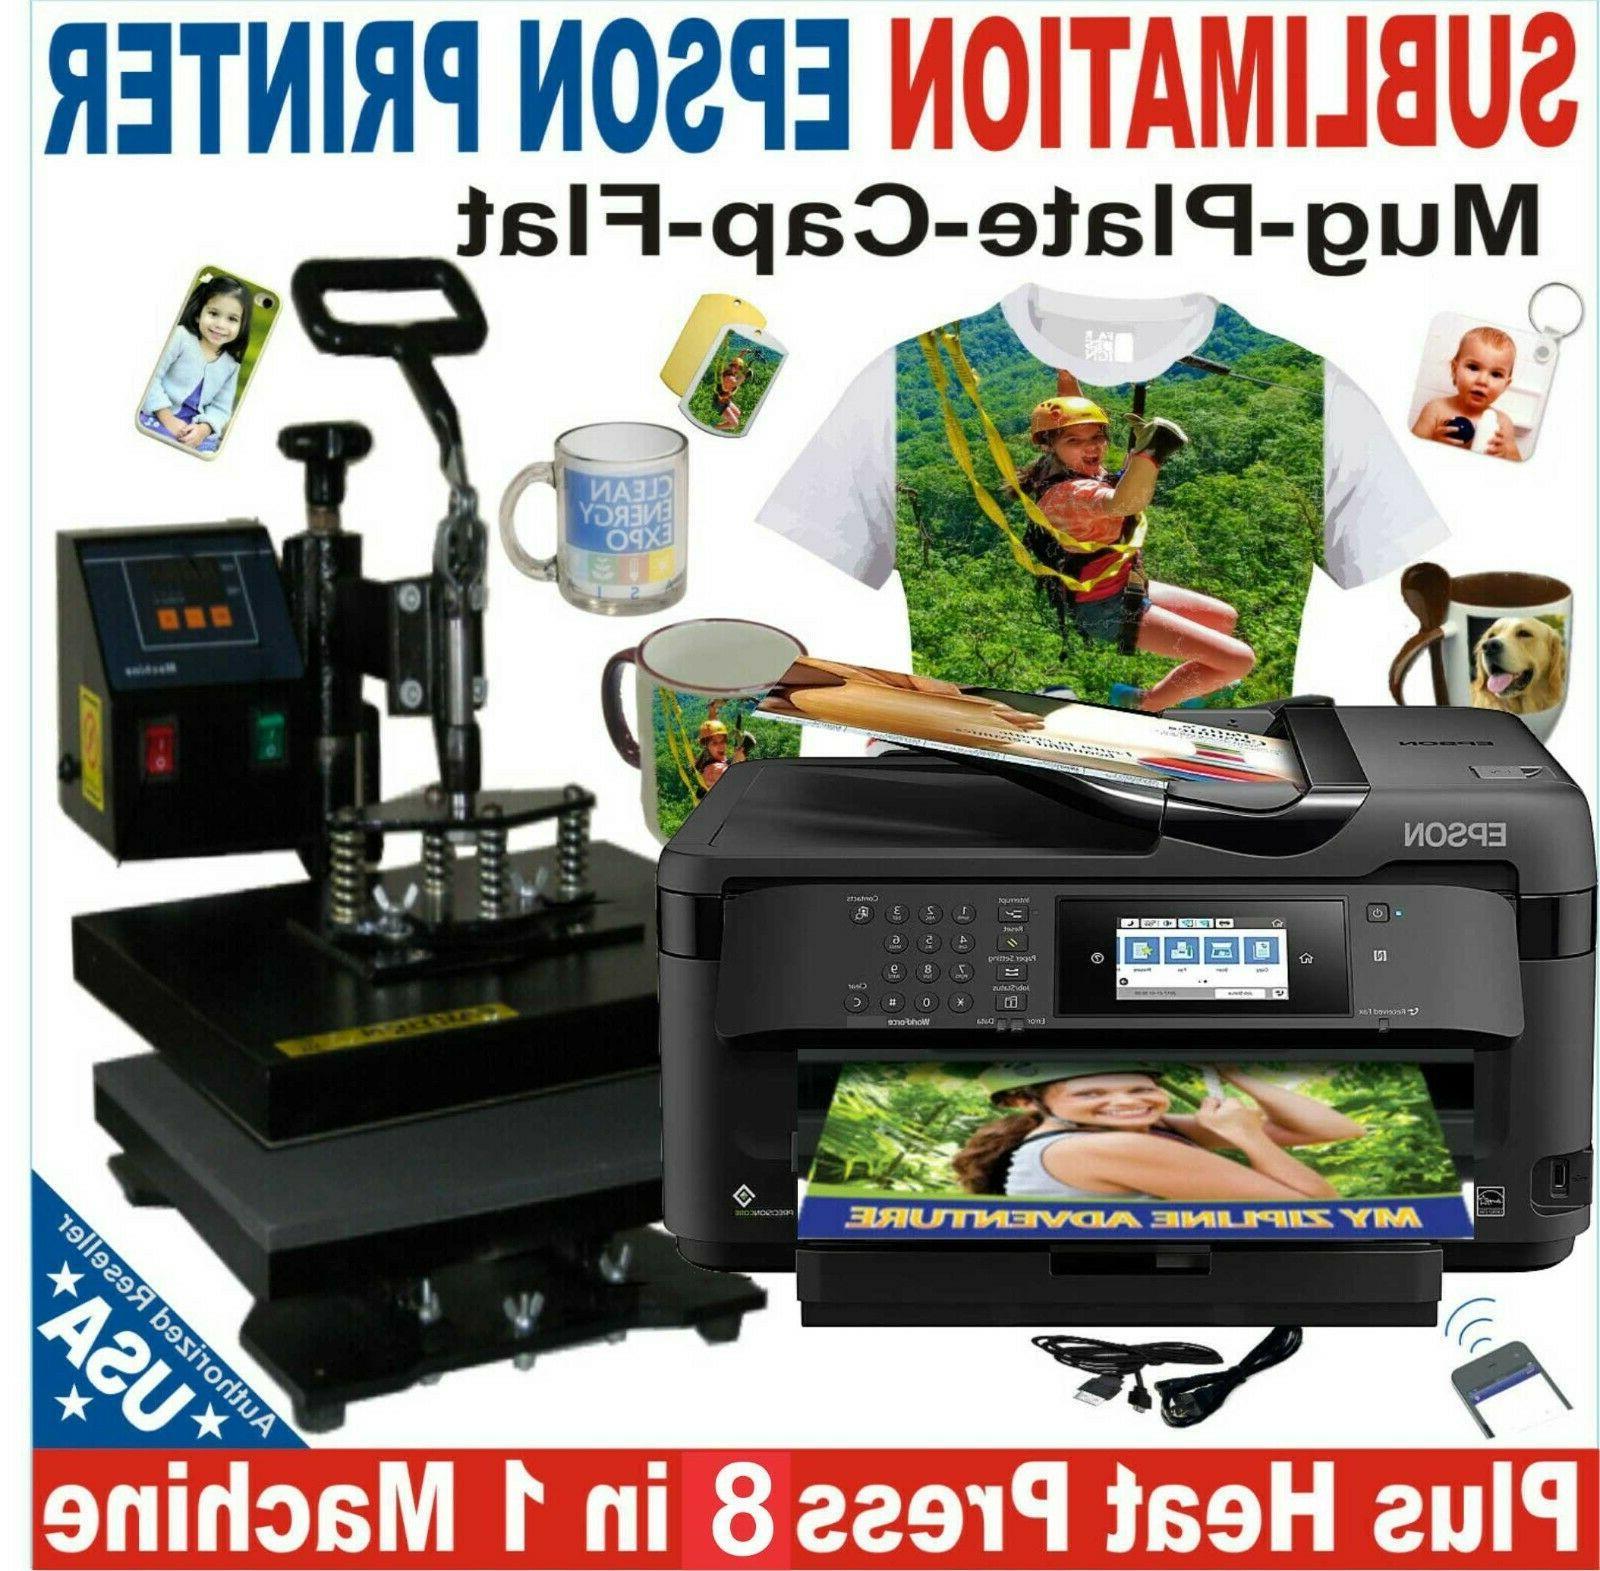 6 in1 heat press transfer 15x15 plate